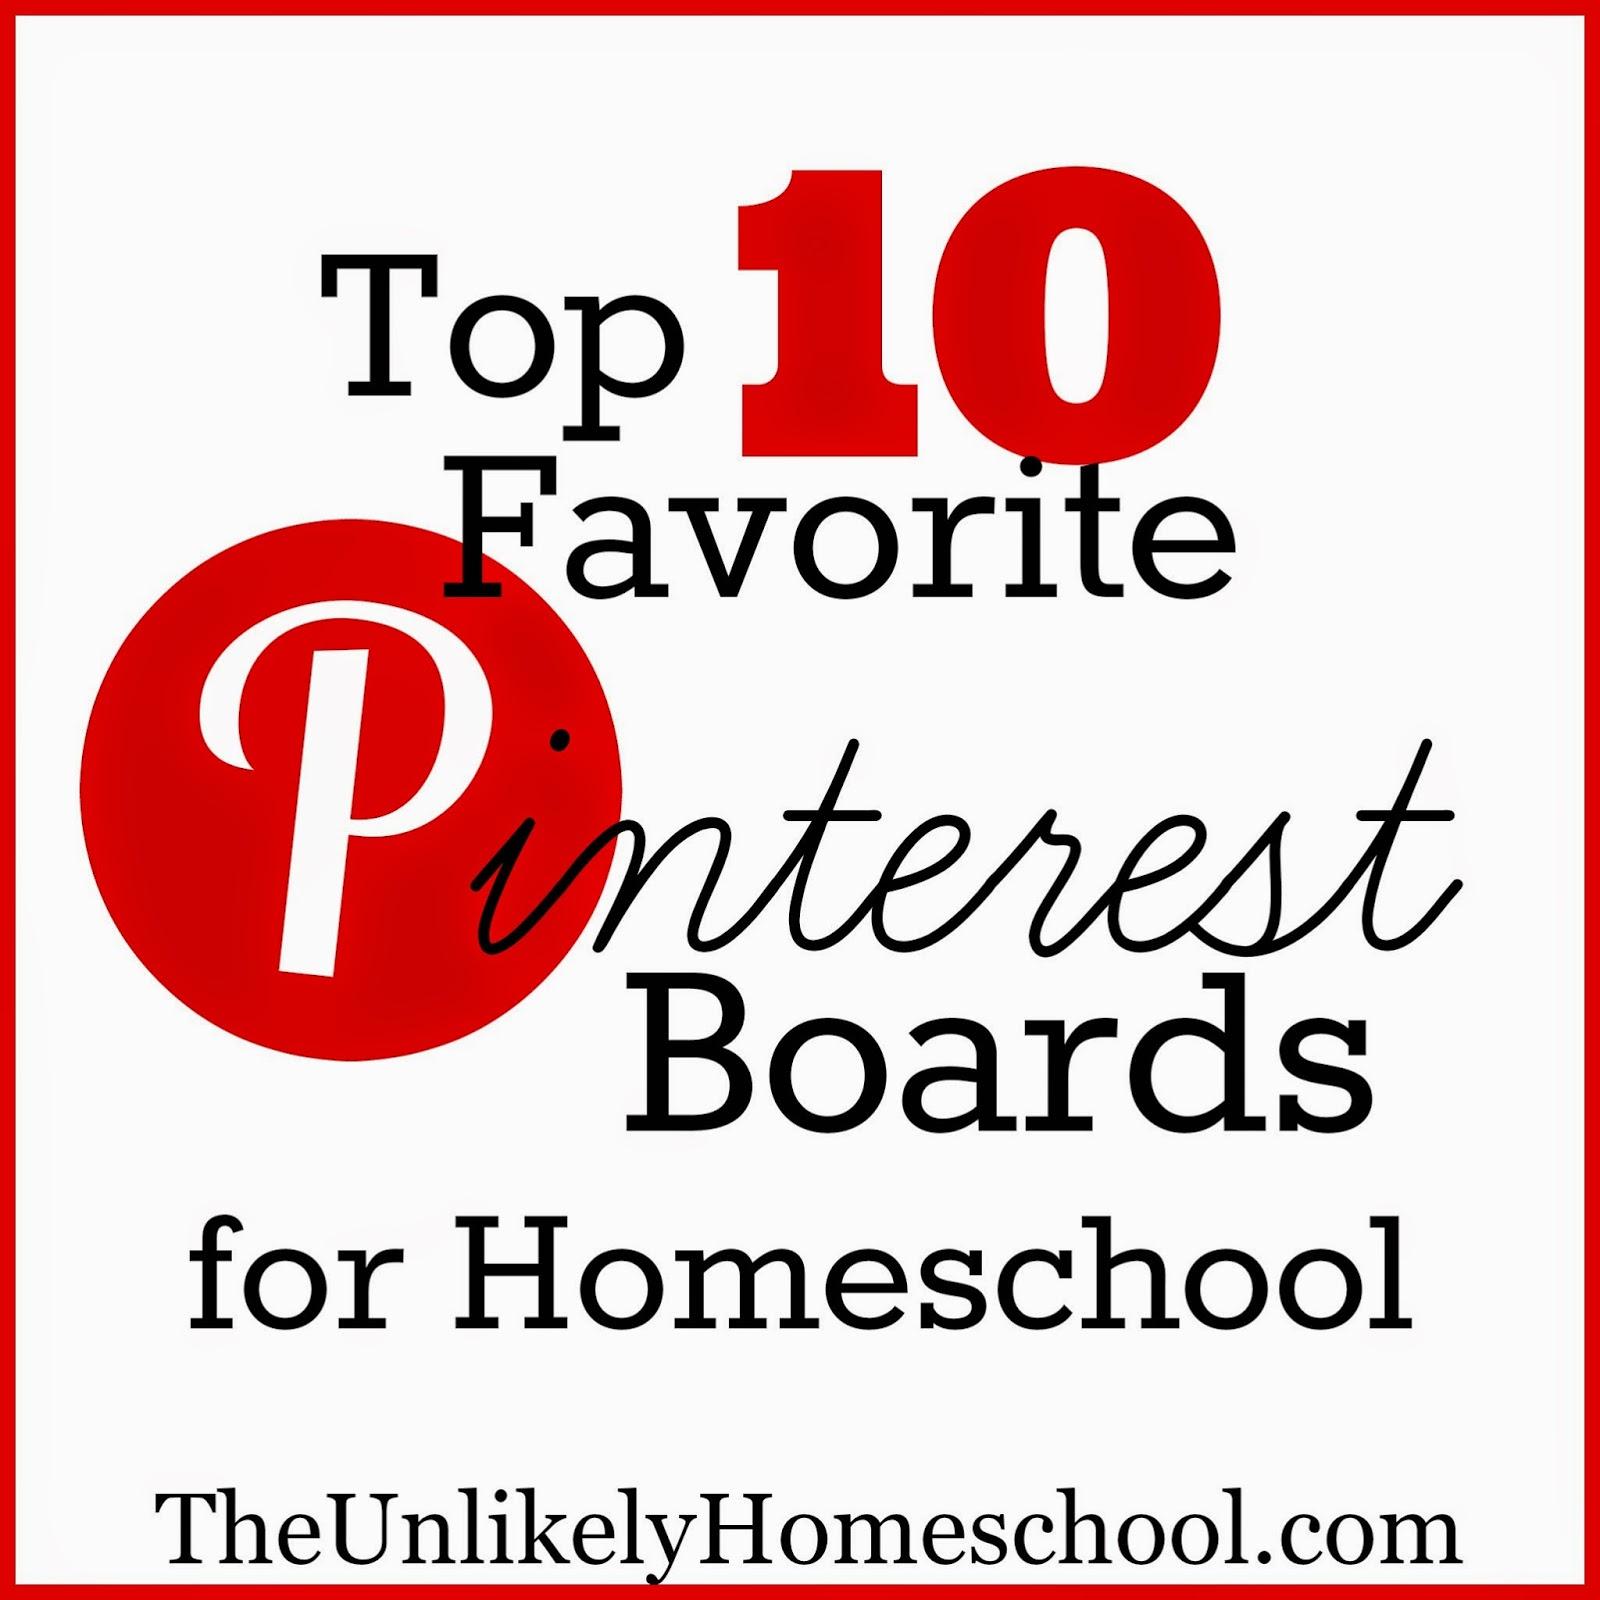 Top 10 Favorite Pinterest Boards for Homeschool {The Unlikely Homeschool}